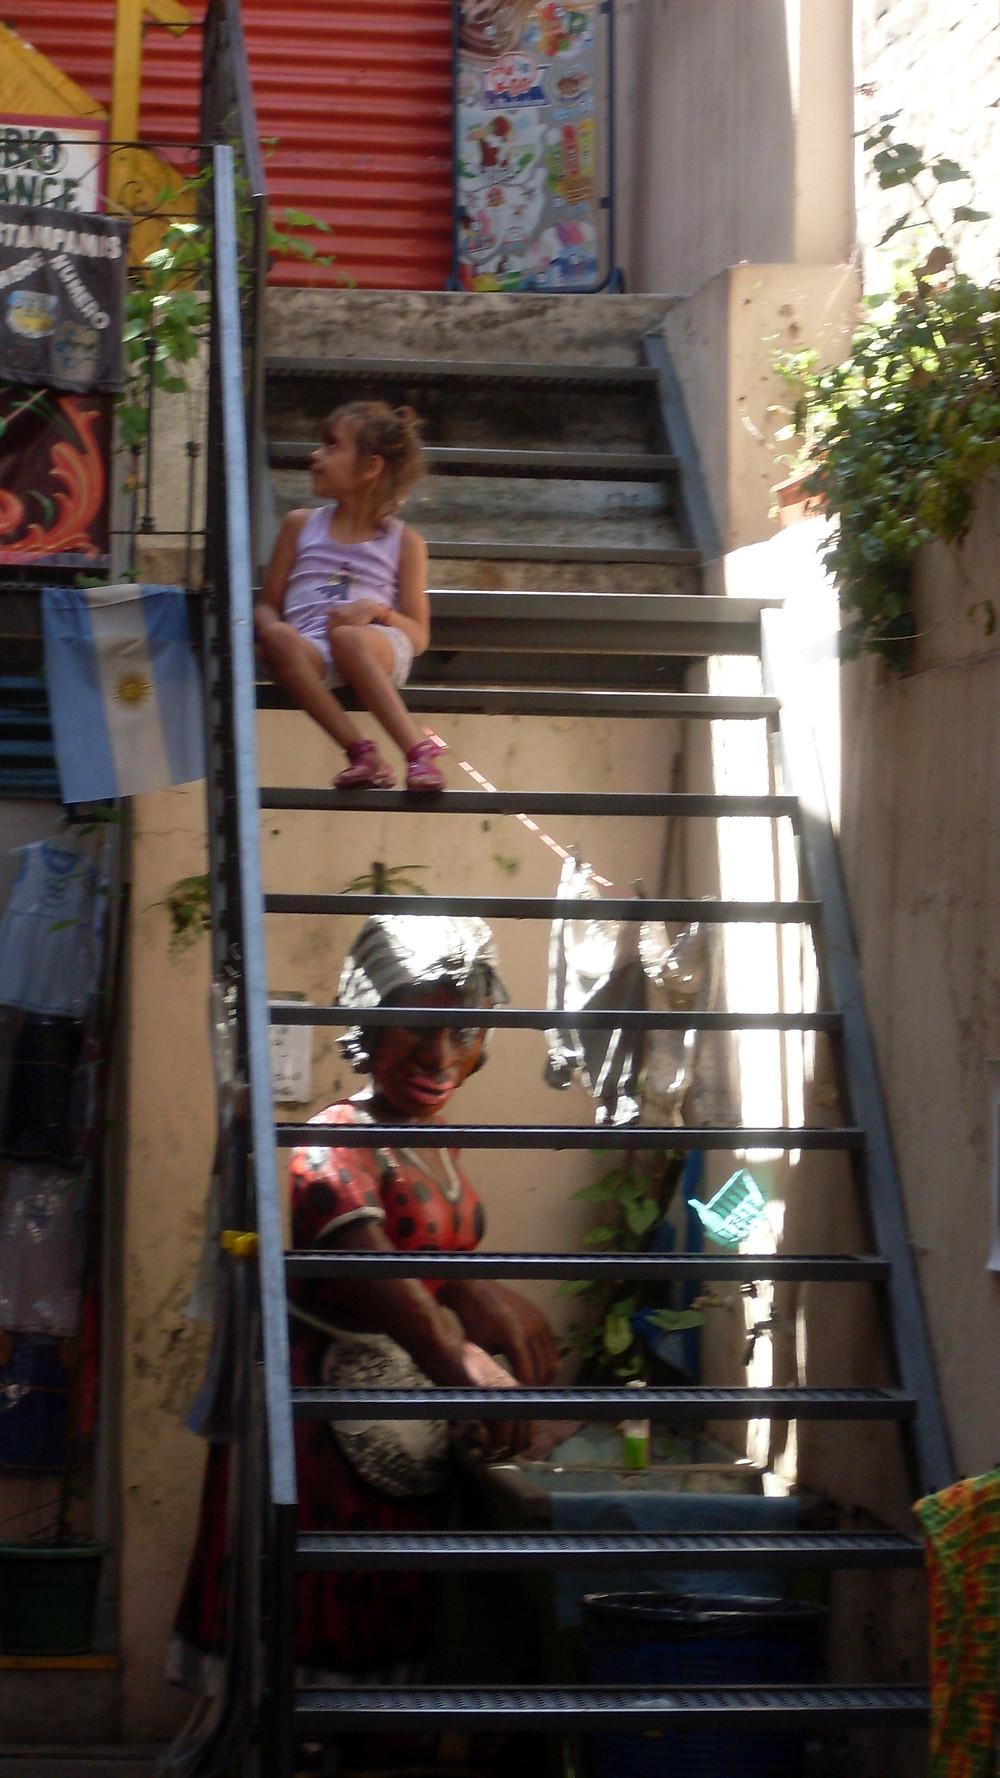 Little girl sitting on stairs in La Boca